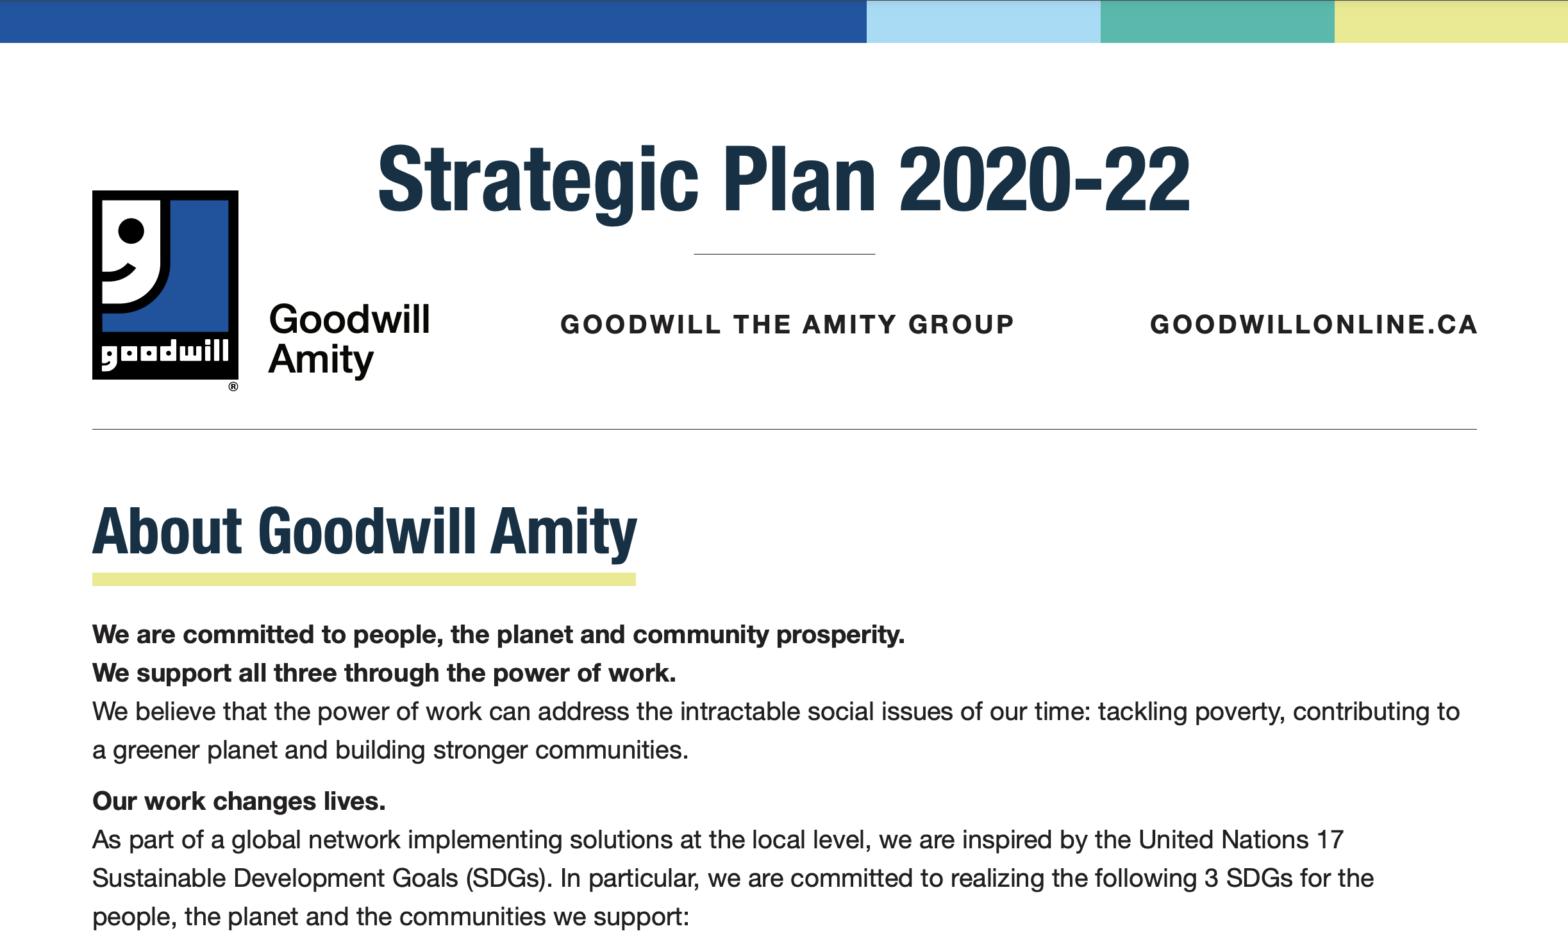 Thumbnail screenshot of the Goodwill Amity Strategic Plan 2020-22